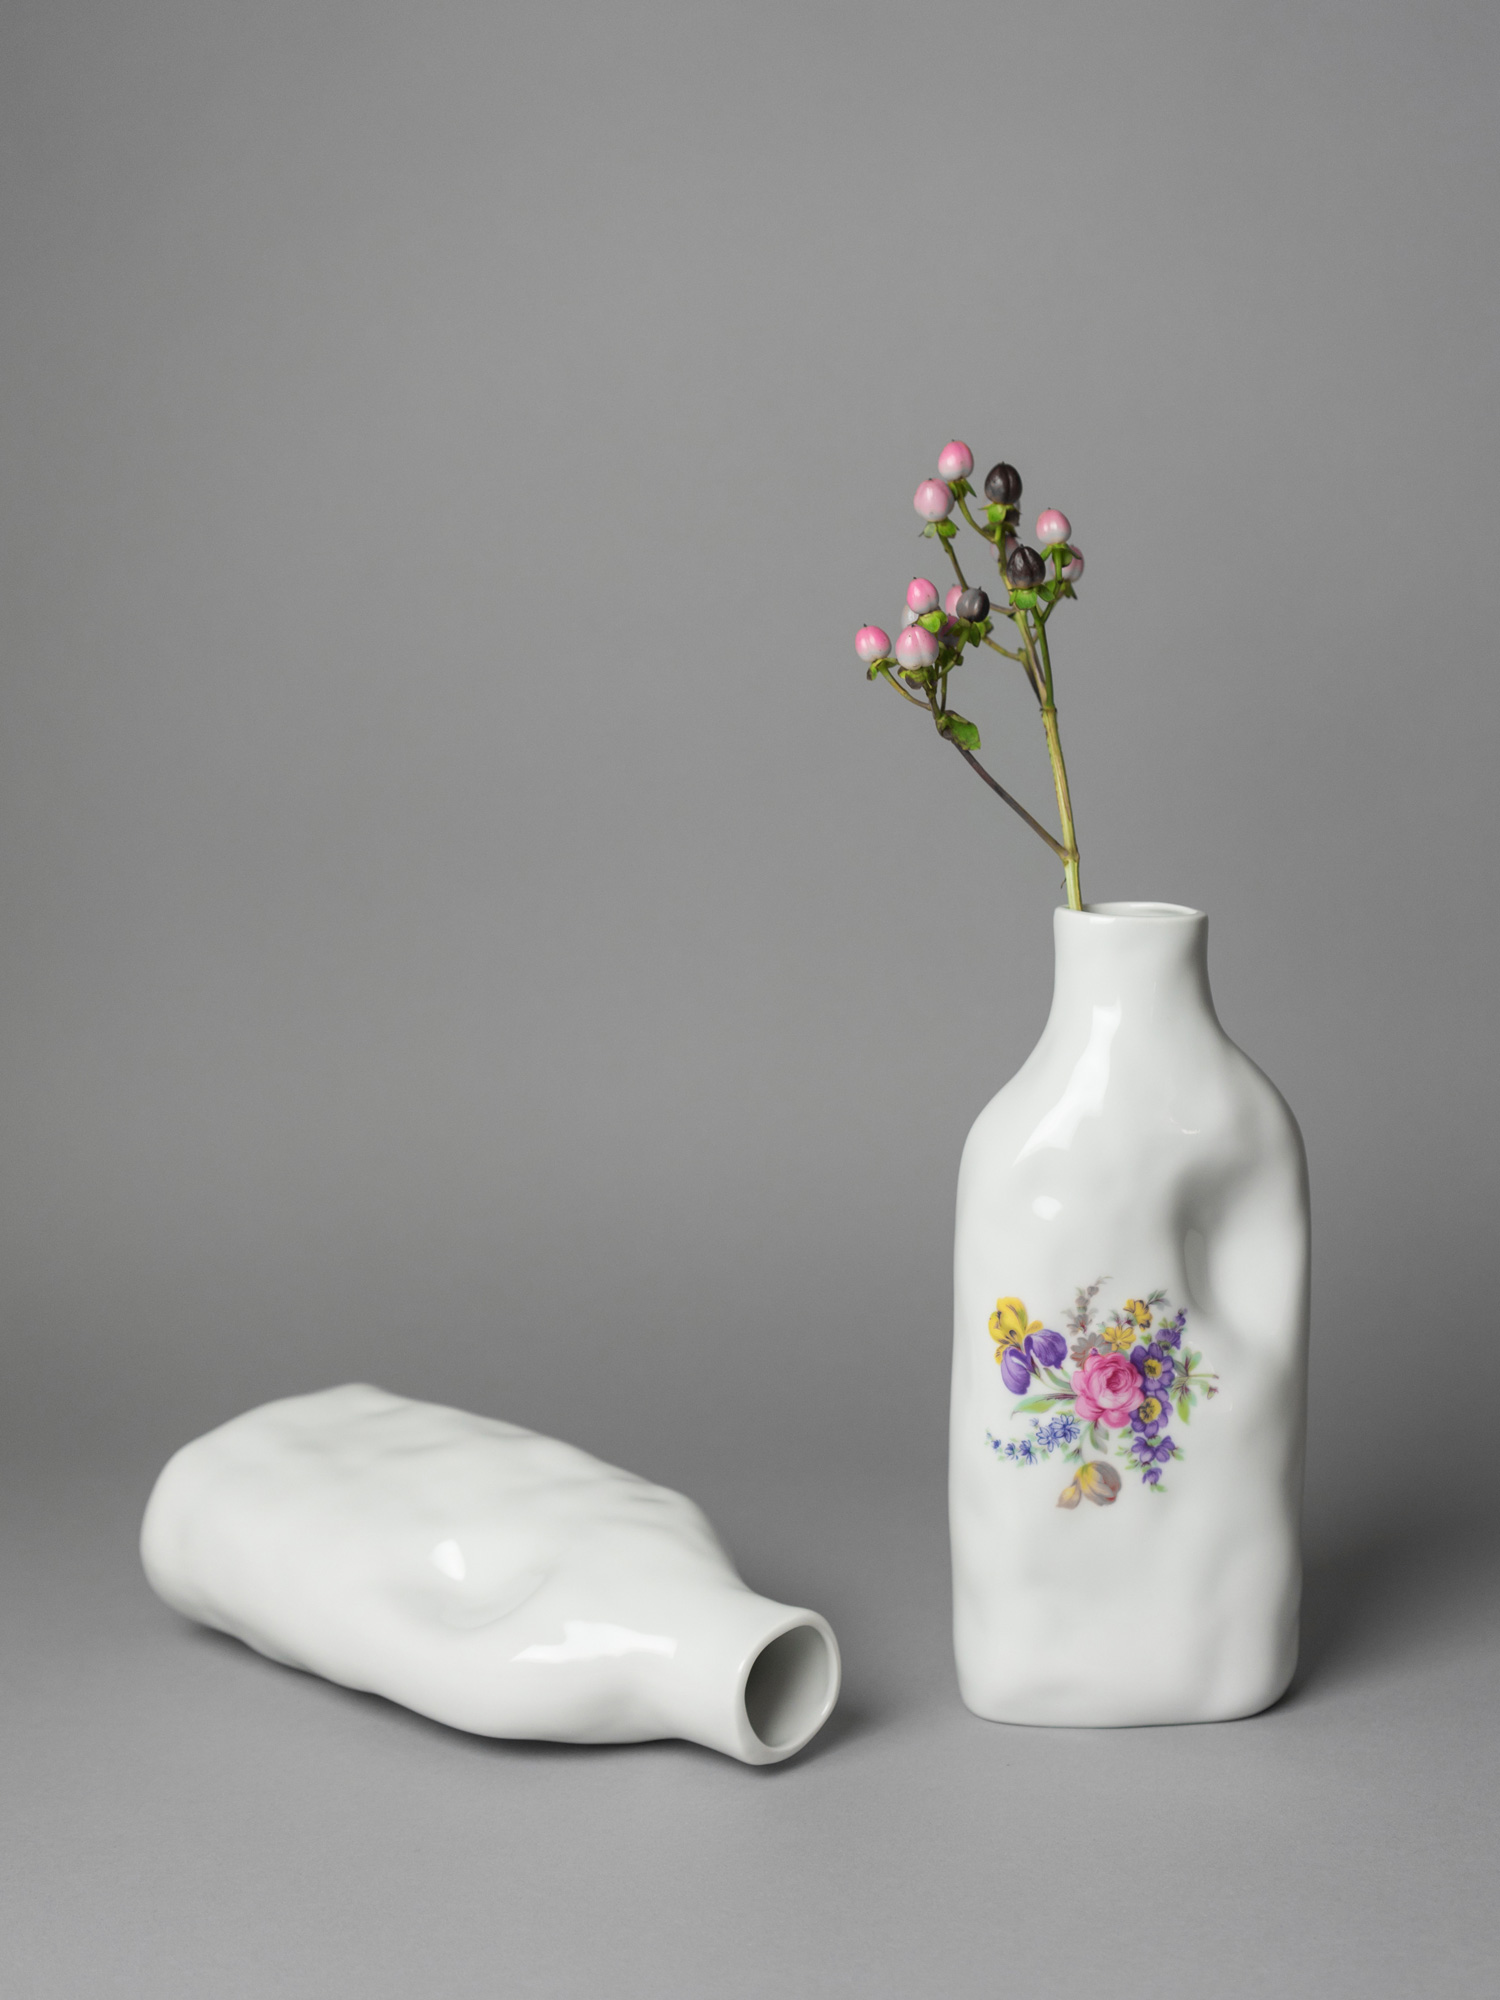 White porcelain vase with floral pattern handmade by Qubus design studio